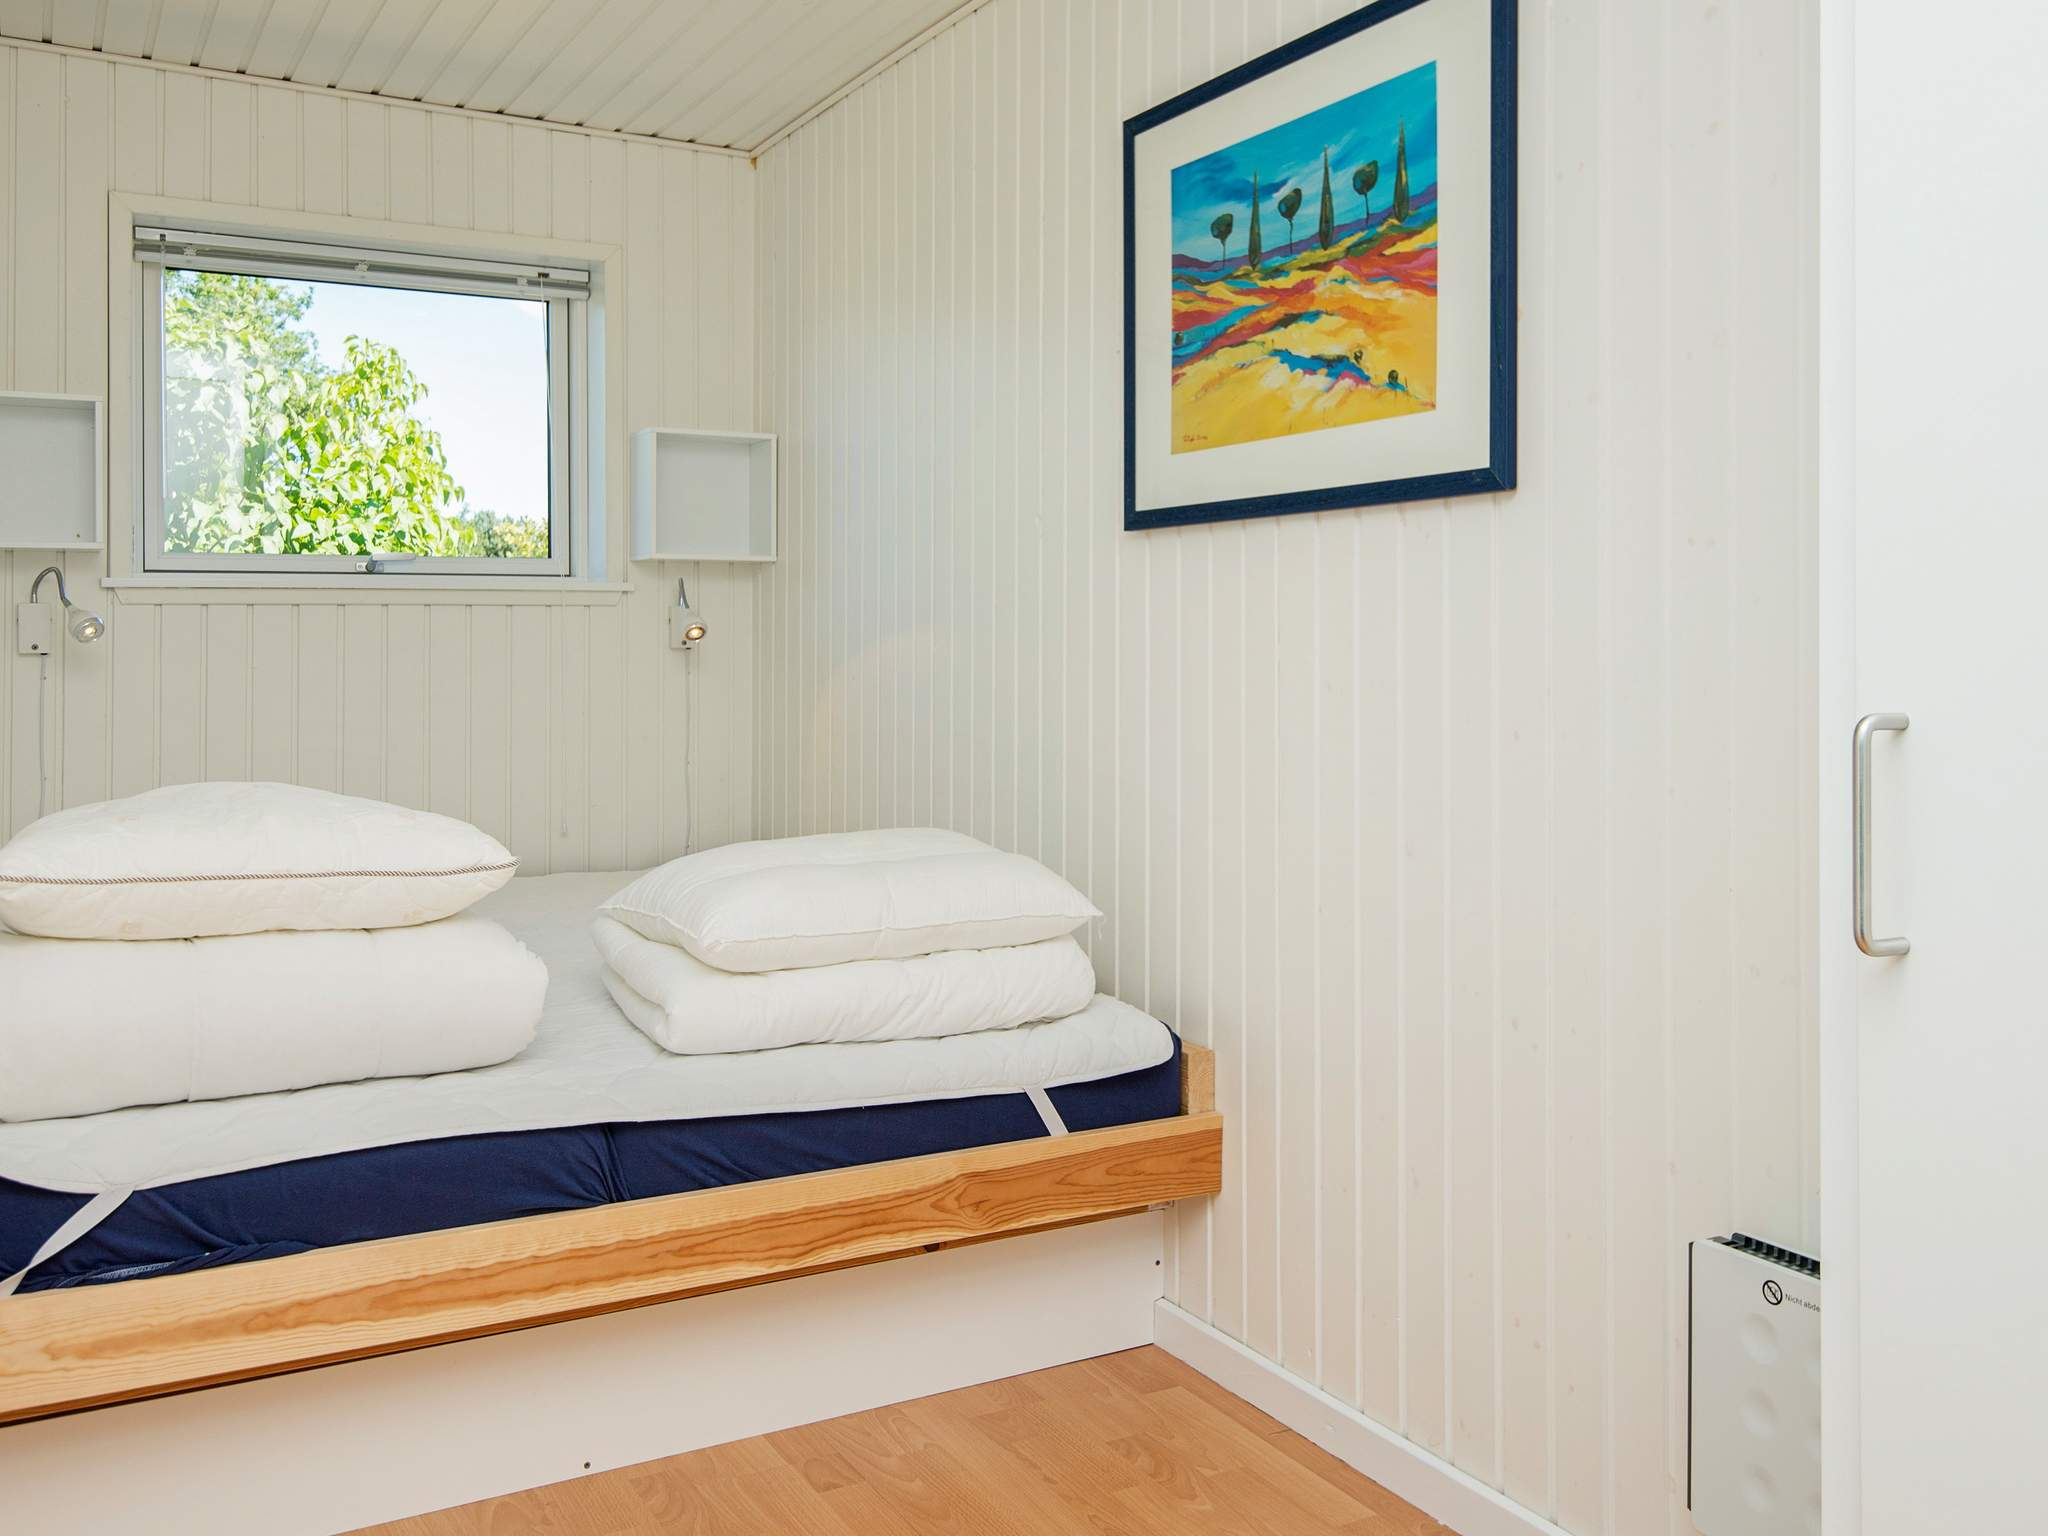 Maison de vacances Helgenæs (978615), Knebel, , Jutland Est, Danemark, image 8